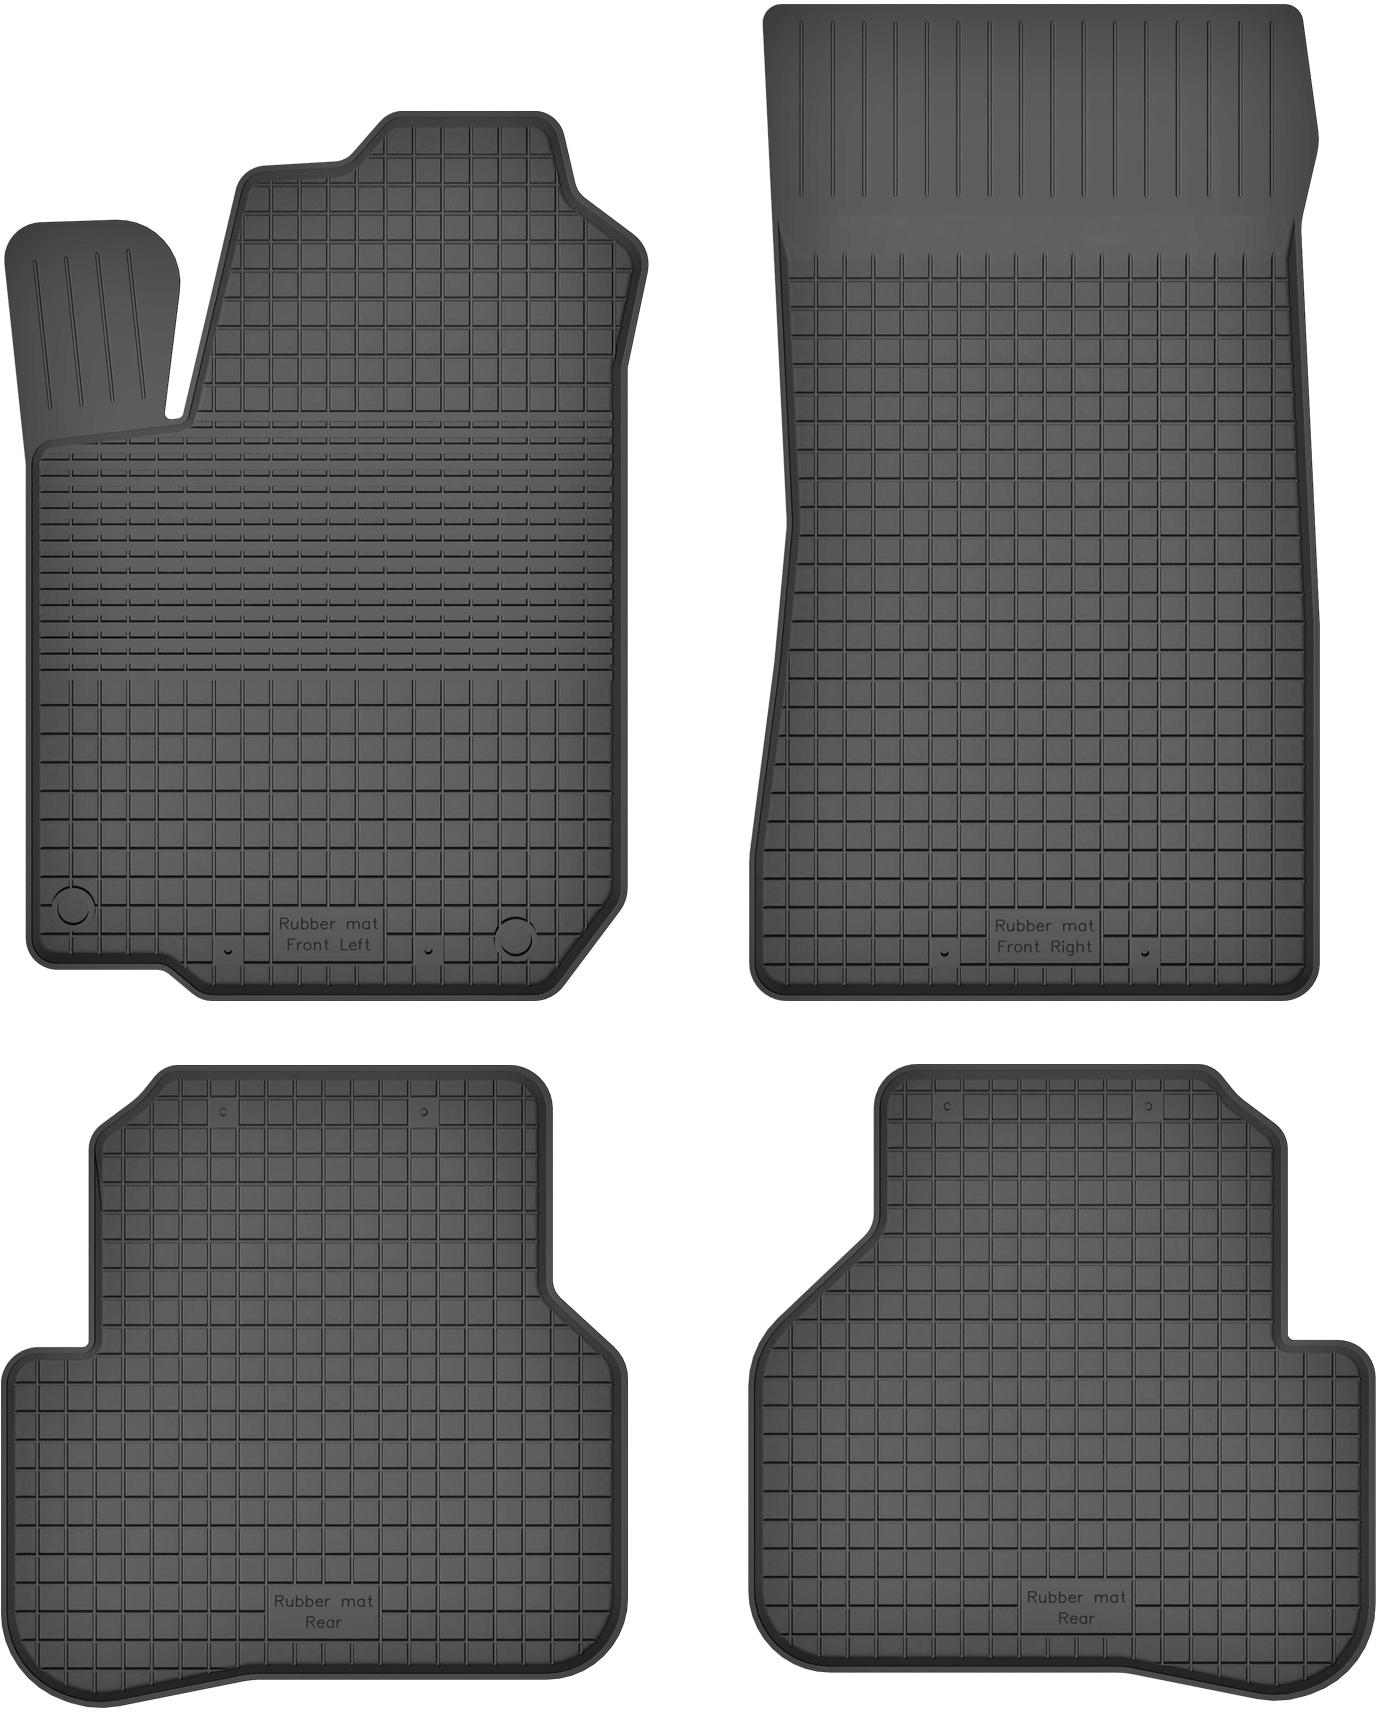 Renault Twingo II (07-14) КОВРИКИ РЕЗИНОВЫЕ КОРЫТКО